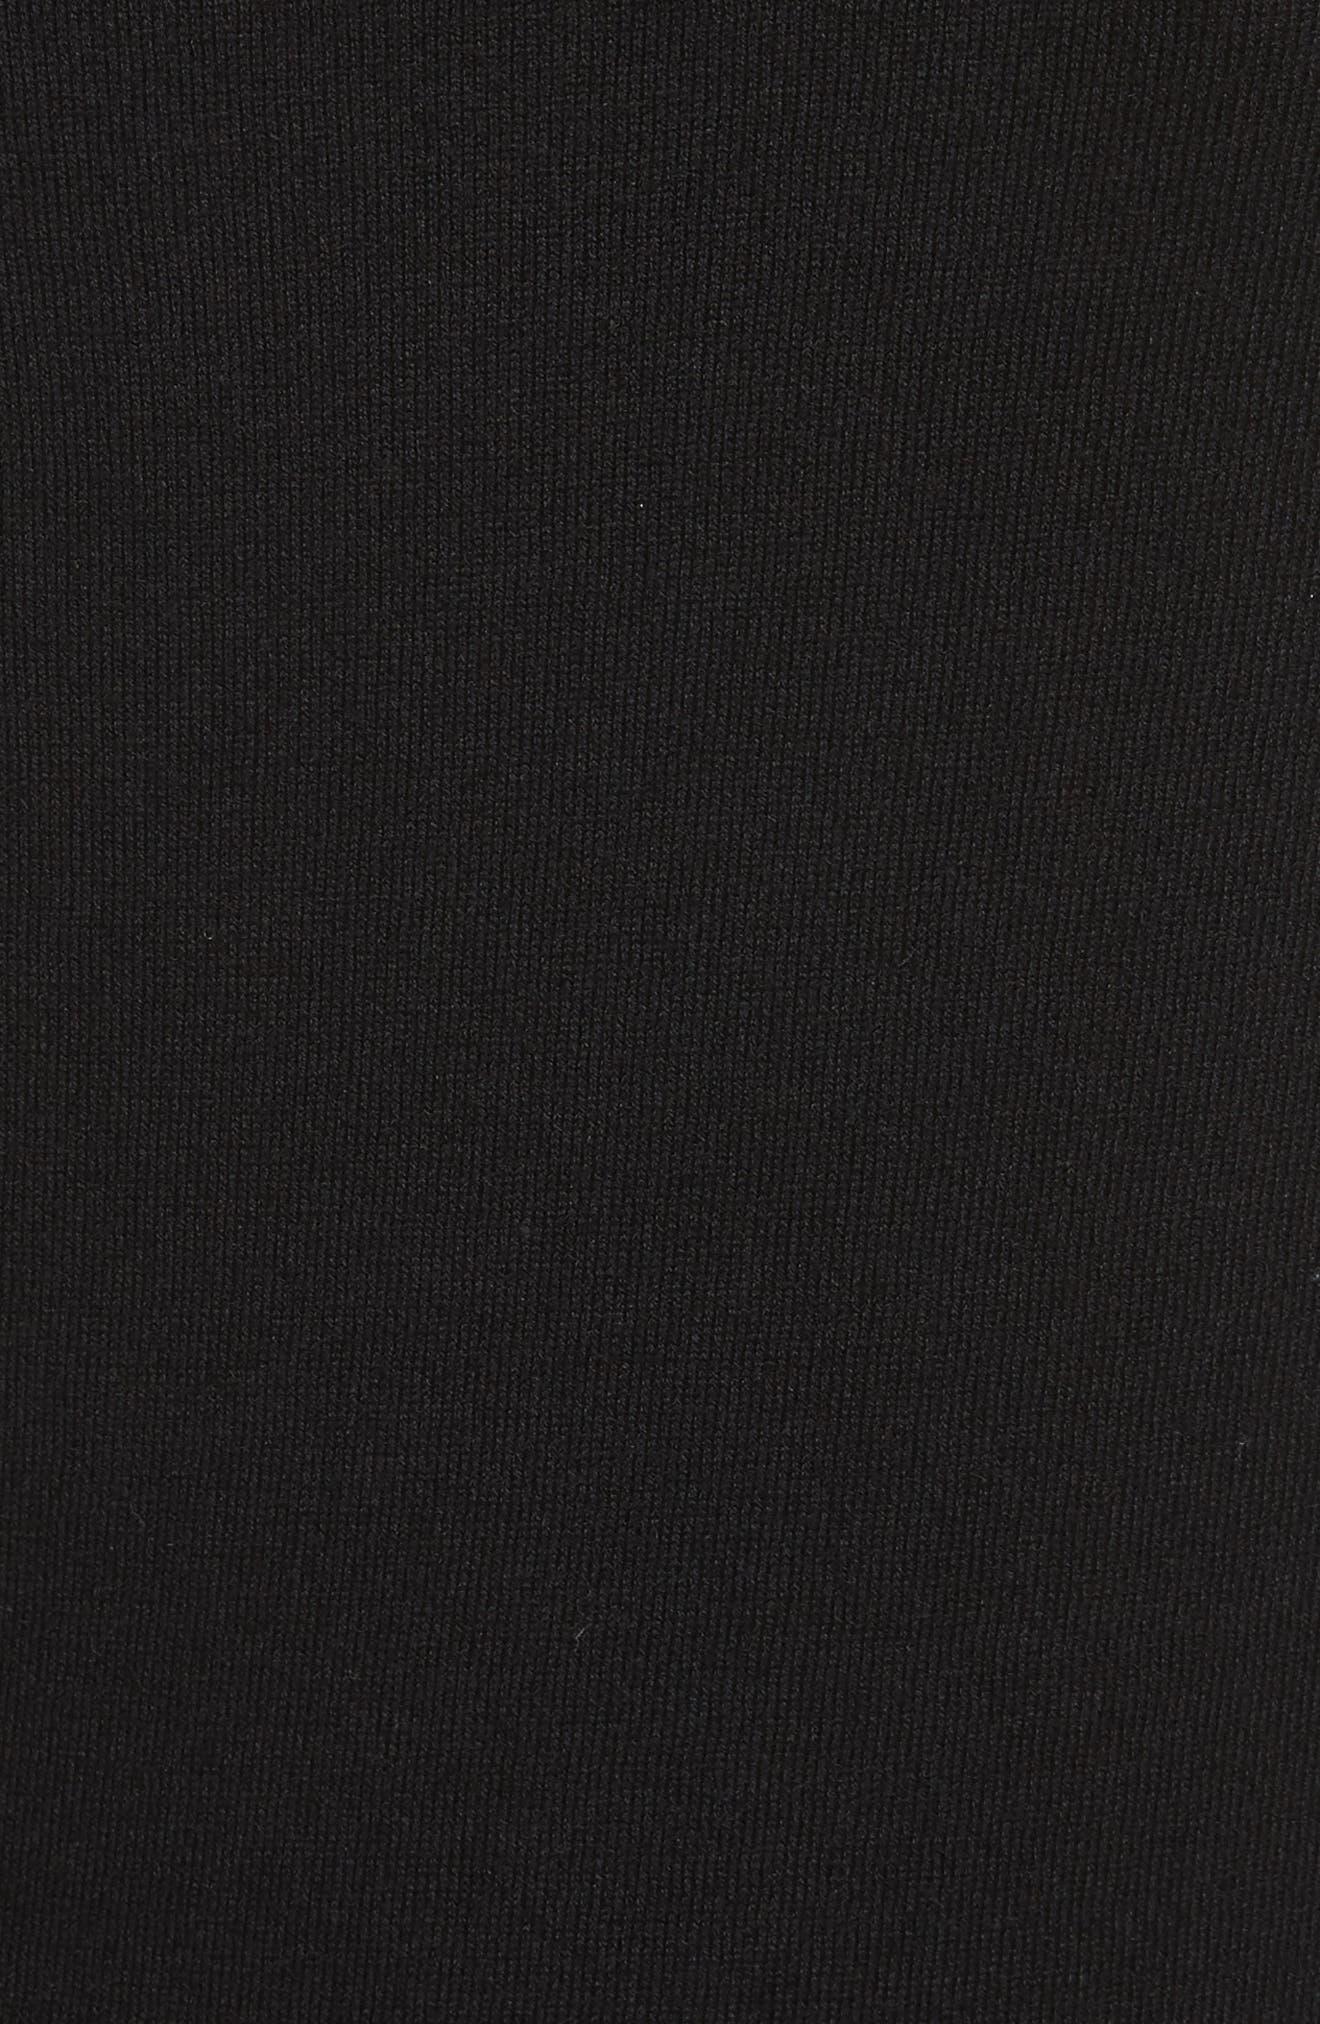 Sparkle Bow Sweater,                             Alternate thumbnail 5, color,                             001